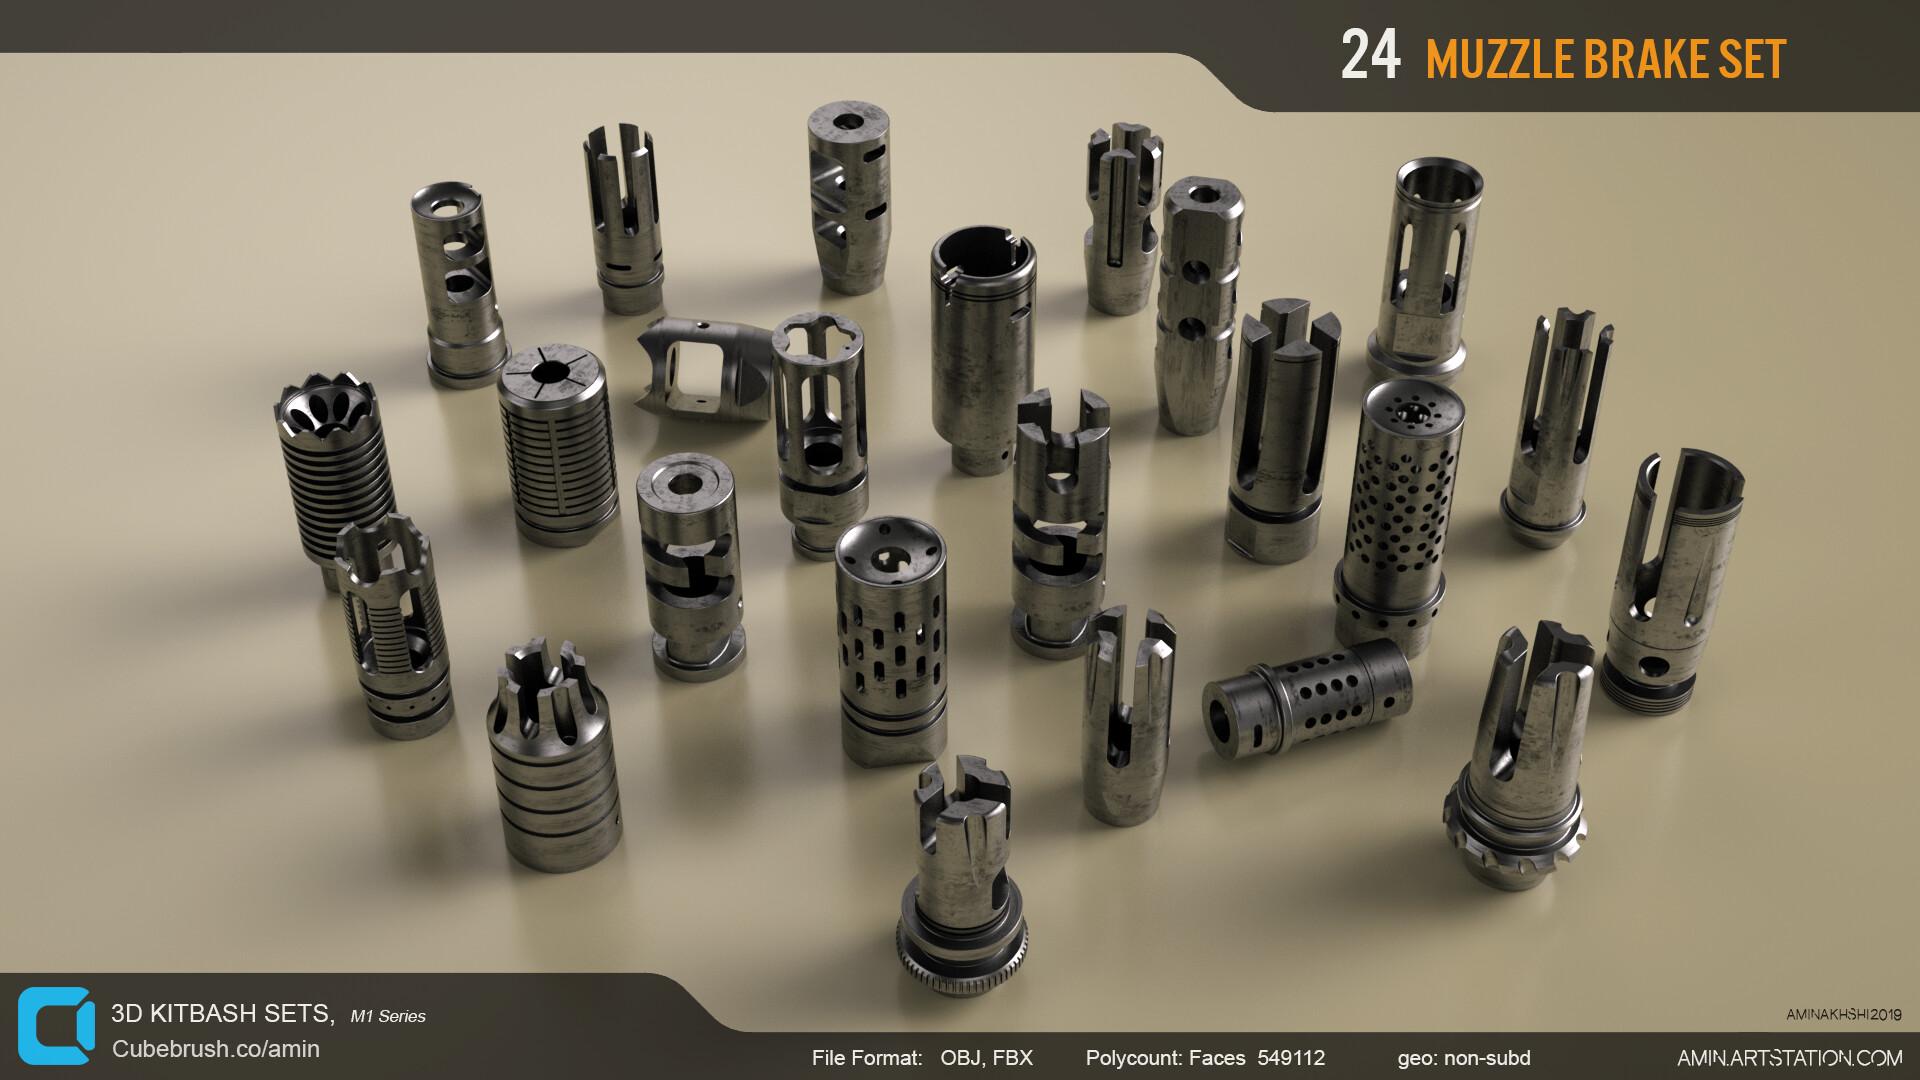 Amin akhshi 005 muzzle brakes set